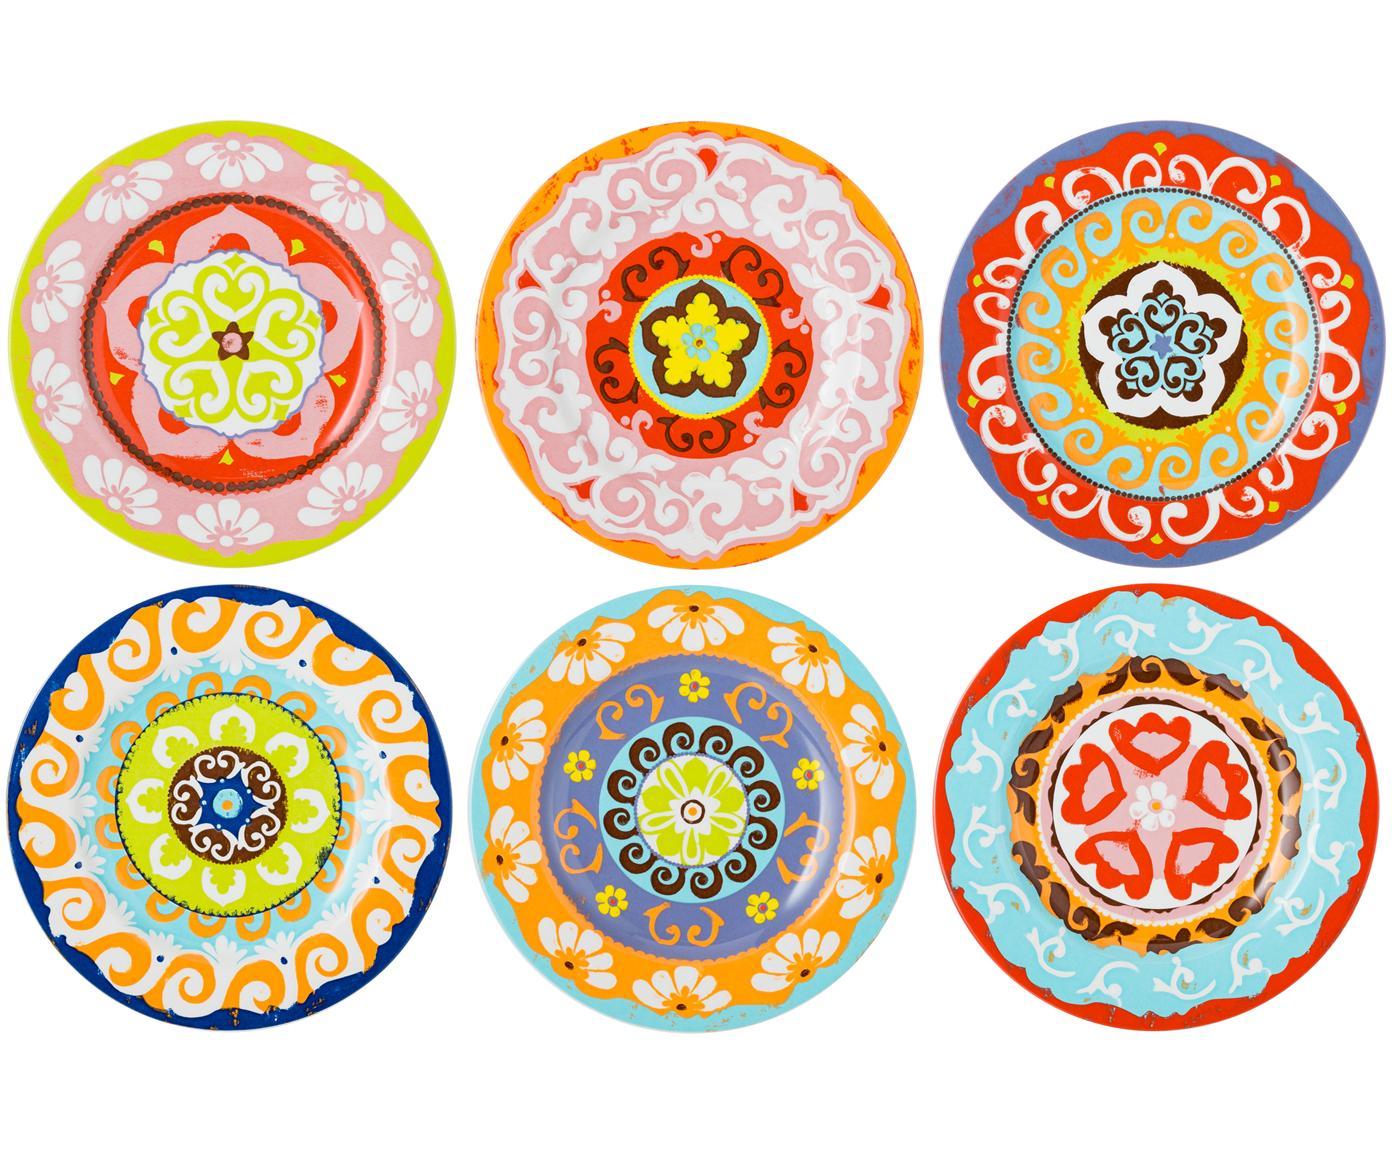 Ontbijtbordenset Nador, 6-delig, Keramiek, Multicolour, Ø 21 cm